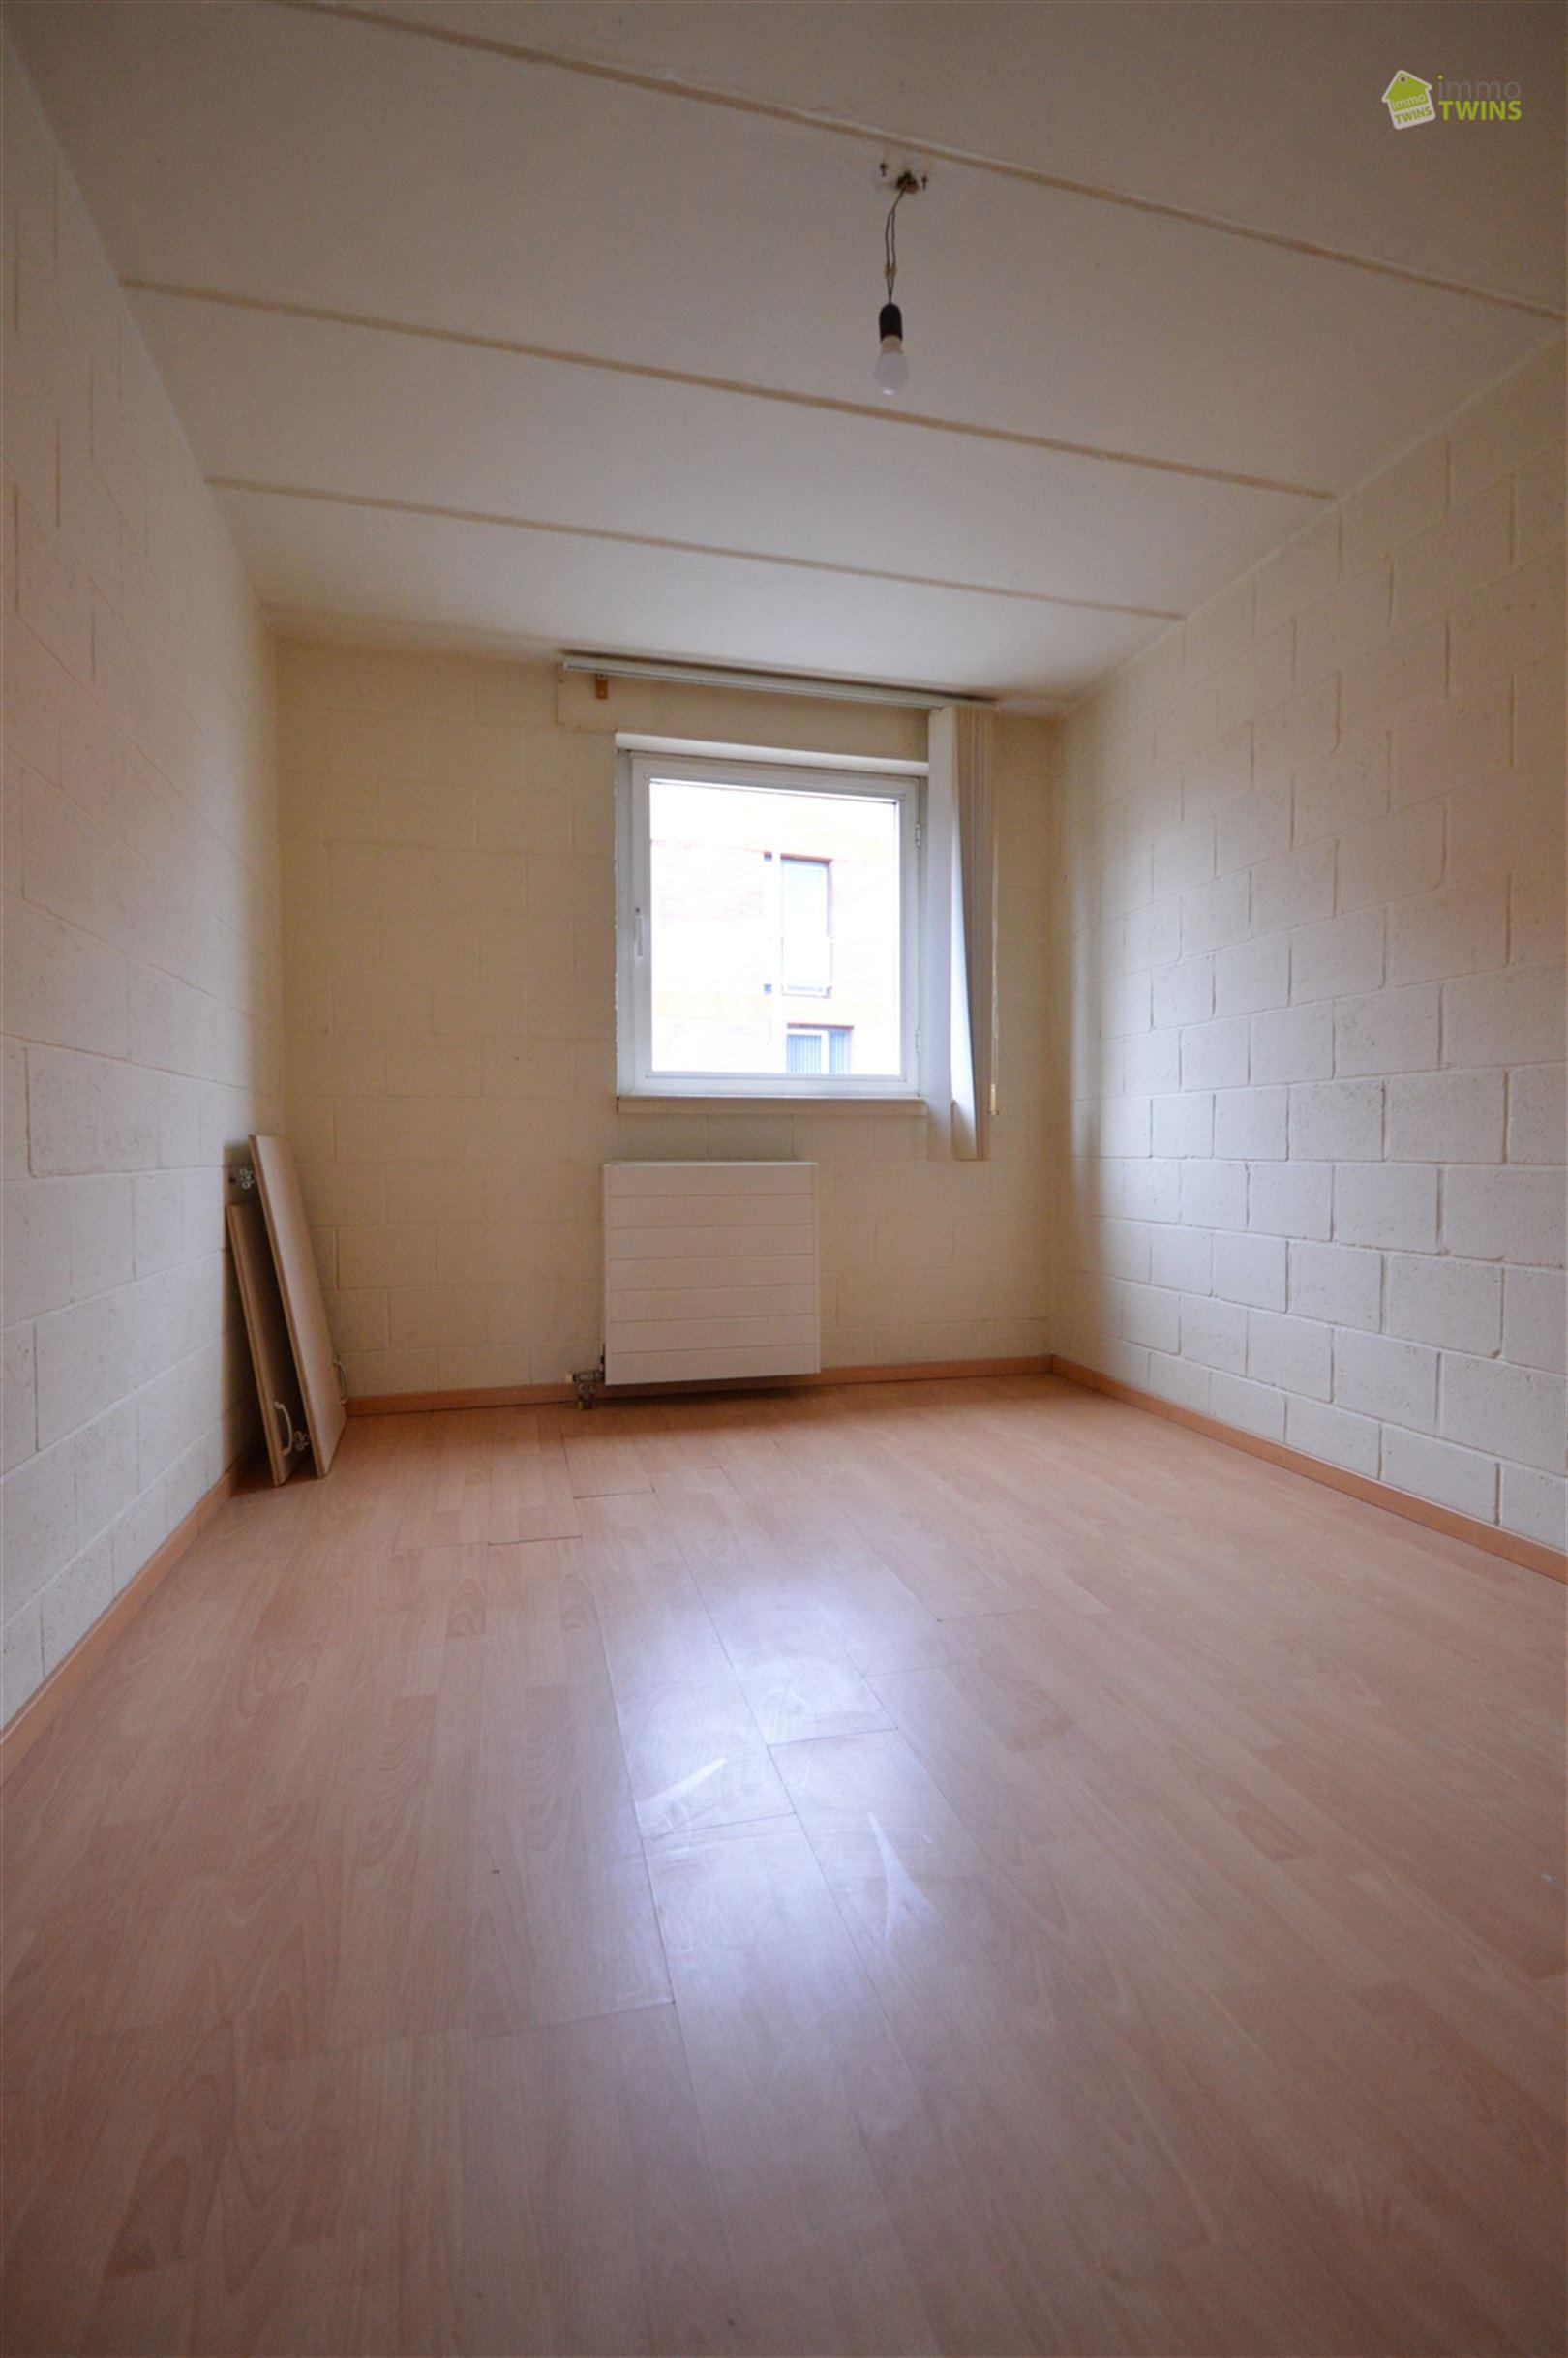 Foto 8 : Appartement te 9200 SINT-GILLIS-DENDERMONDE (België) - Prijs € 535